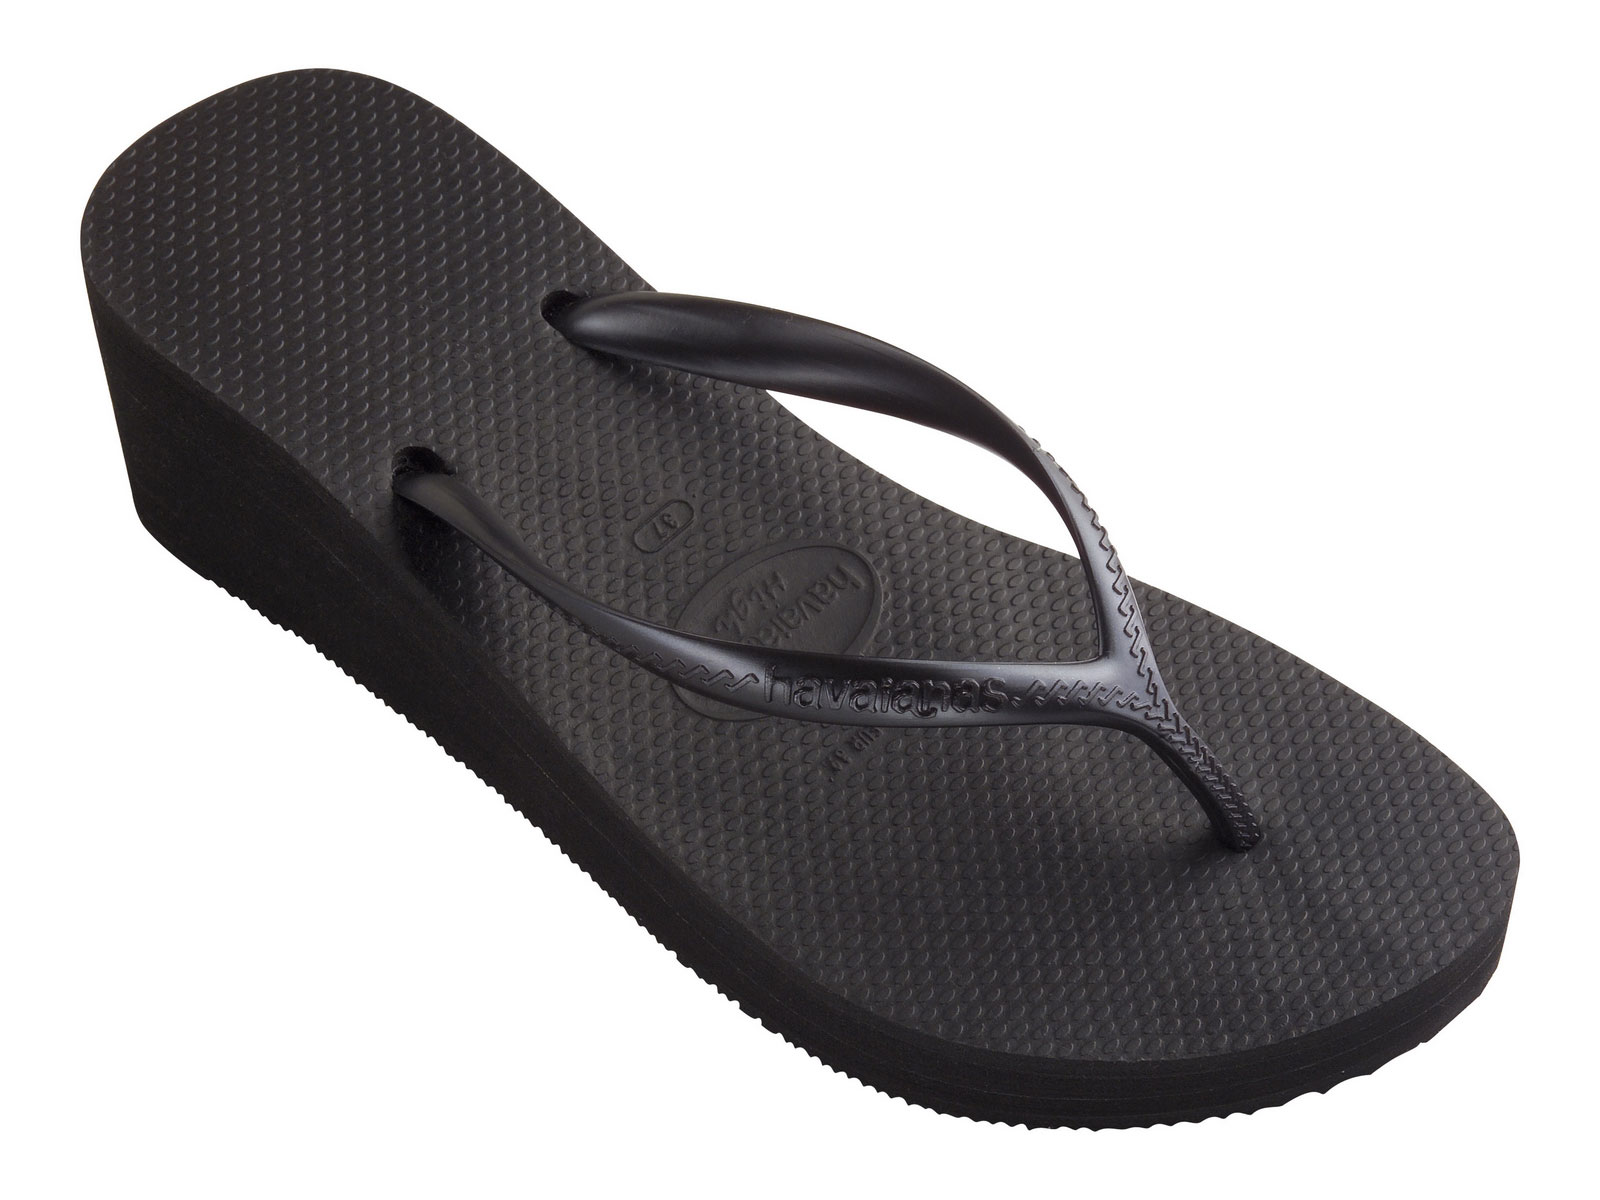 10230c61fc95 Flip-Flops Flip-flops - High Fashion Black - Brand Havaianas